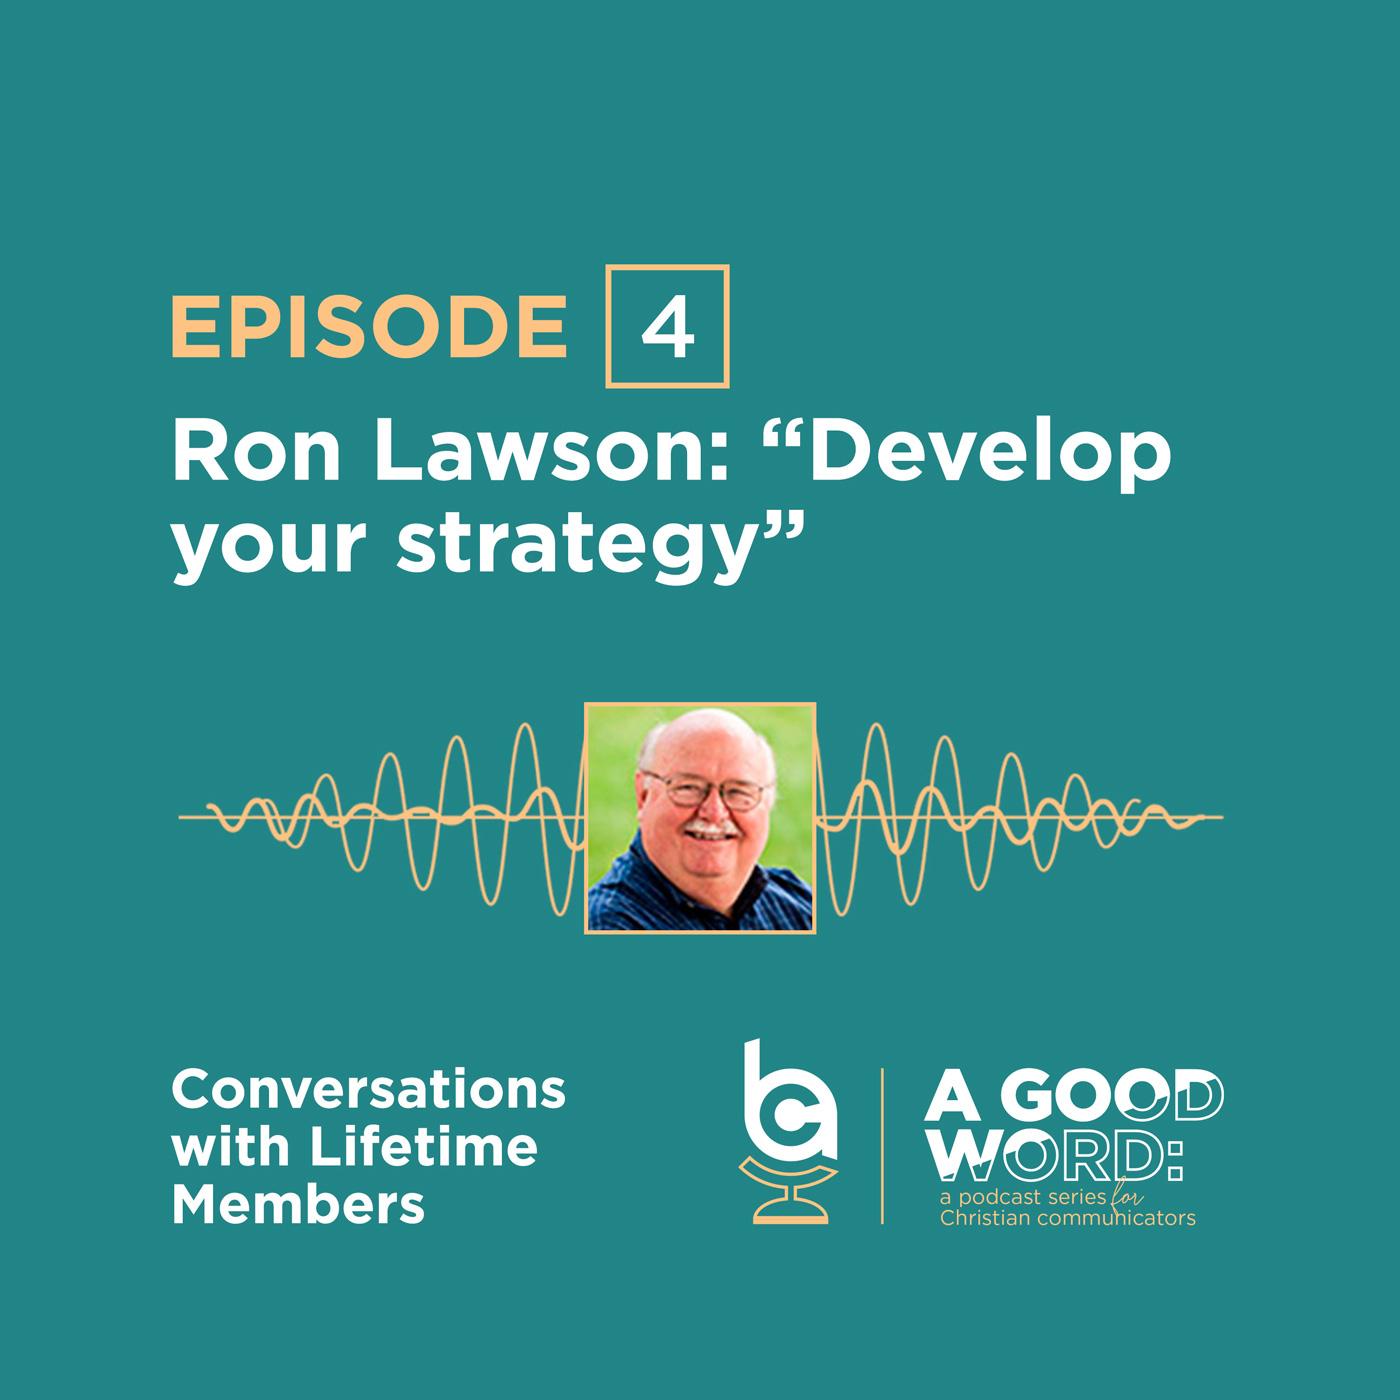 Episode 4: Ron Lawson